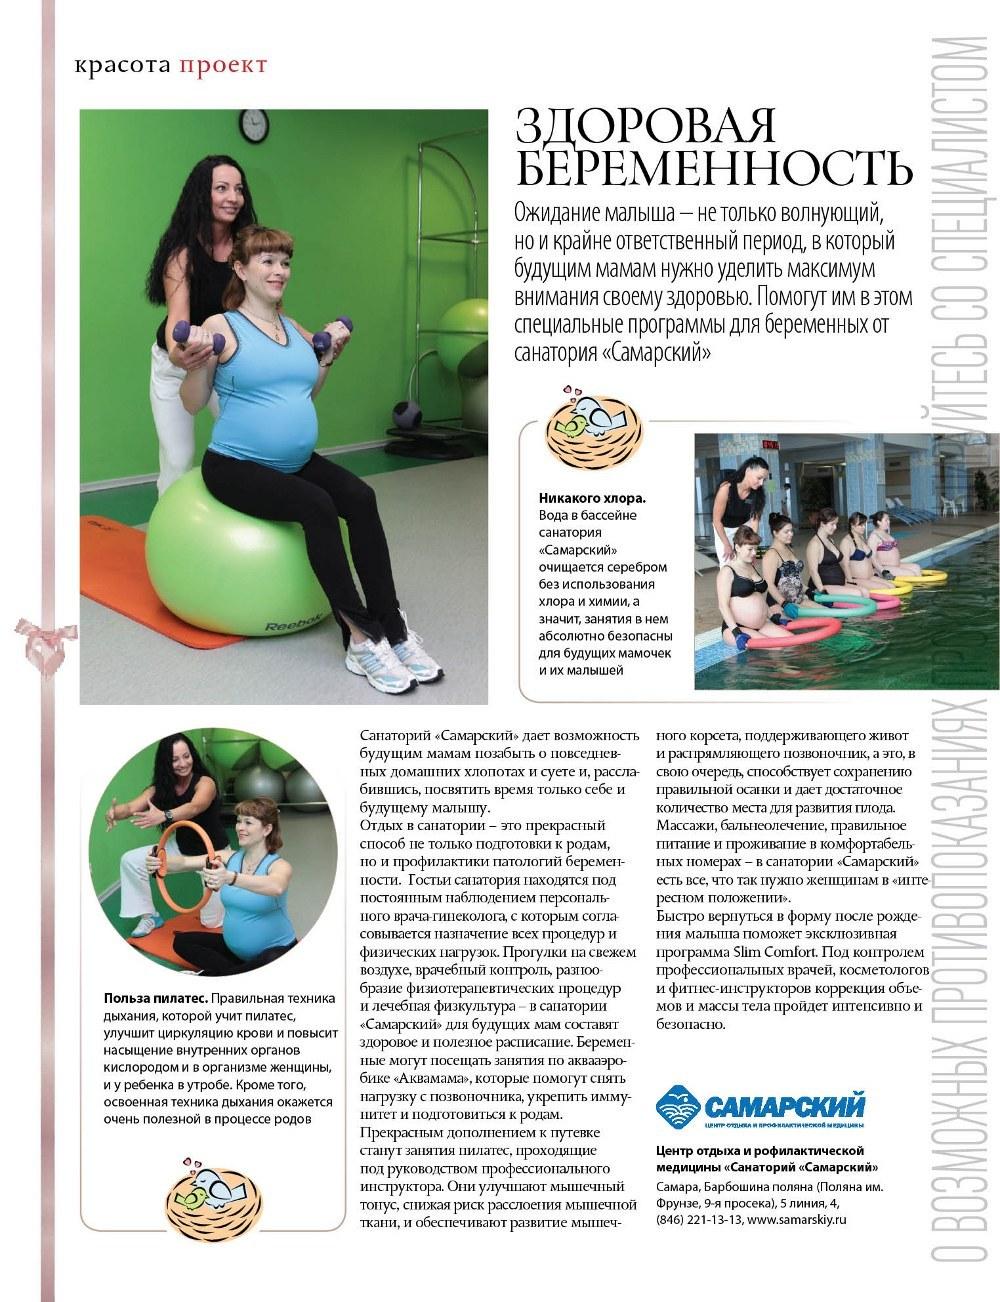 Самарская обл санаторий для беременных